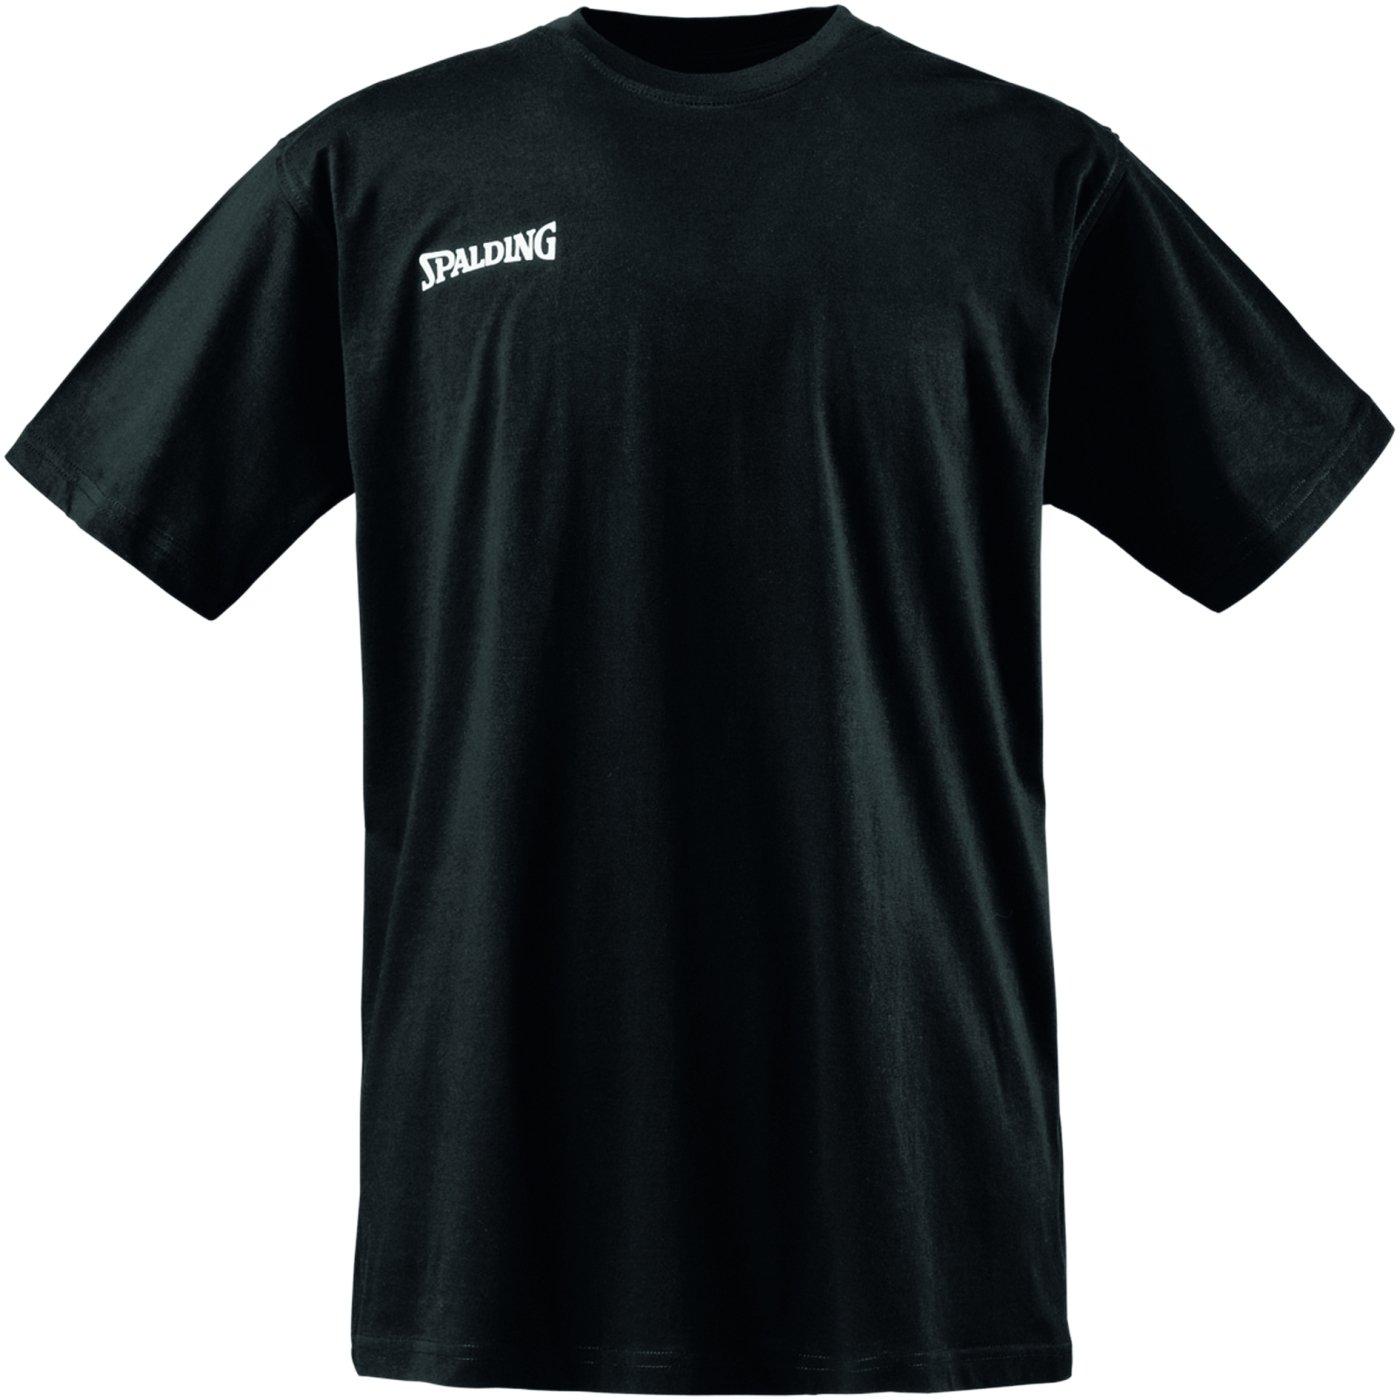 Spalding Promo tee Camiseta Baloncesto, Hombre